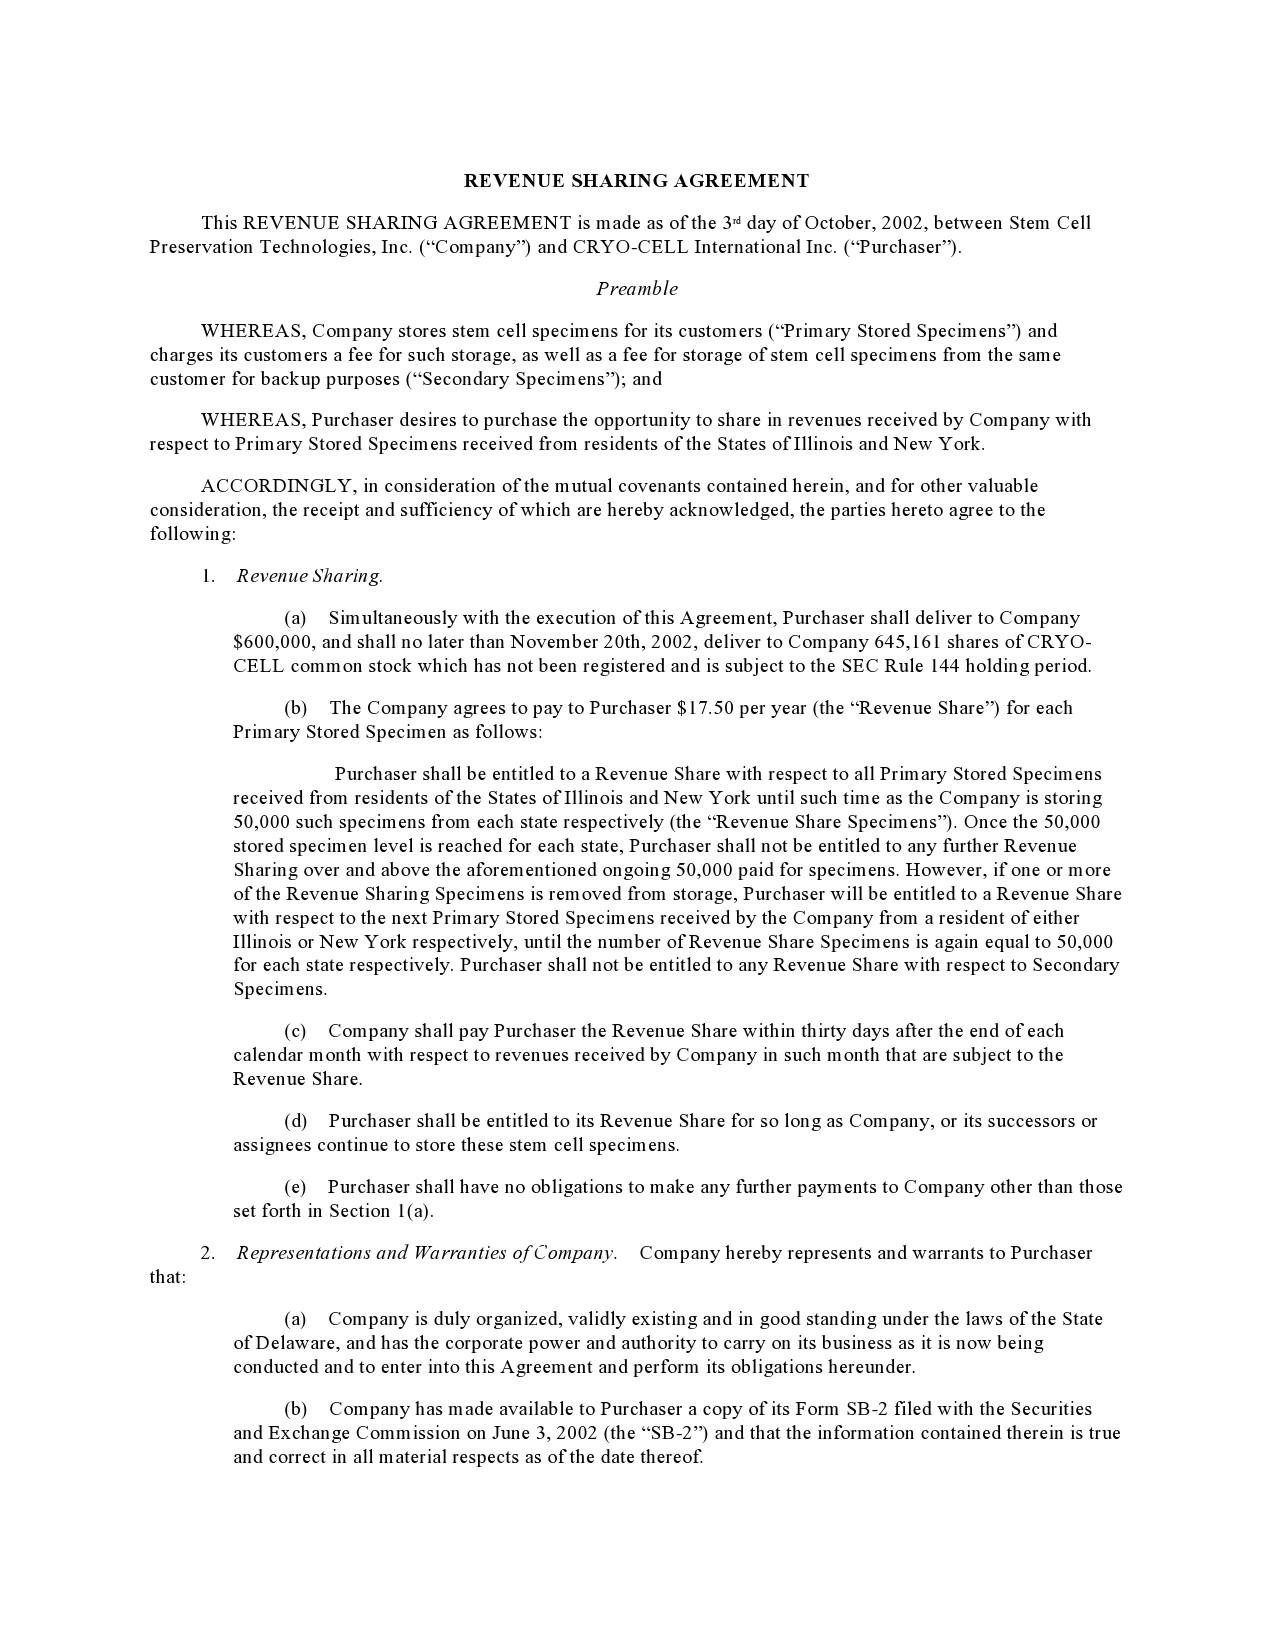 Free profit sharing agreement 24